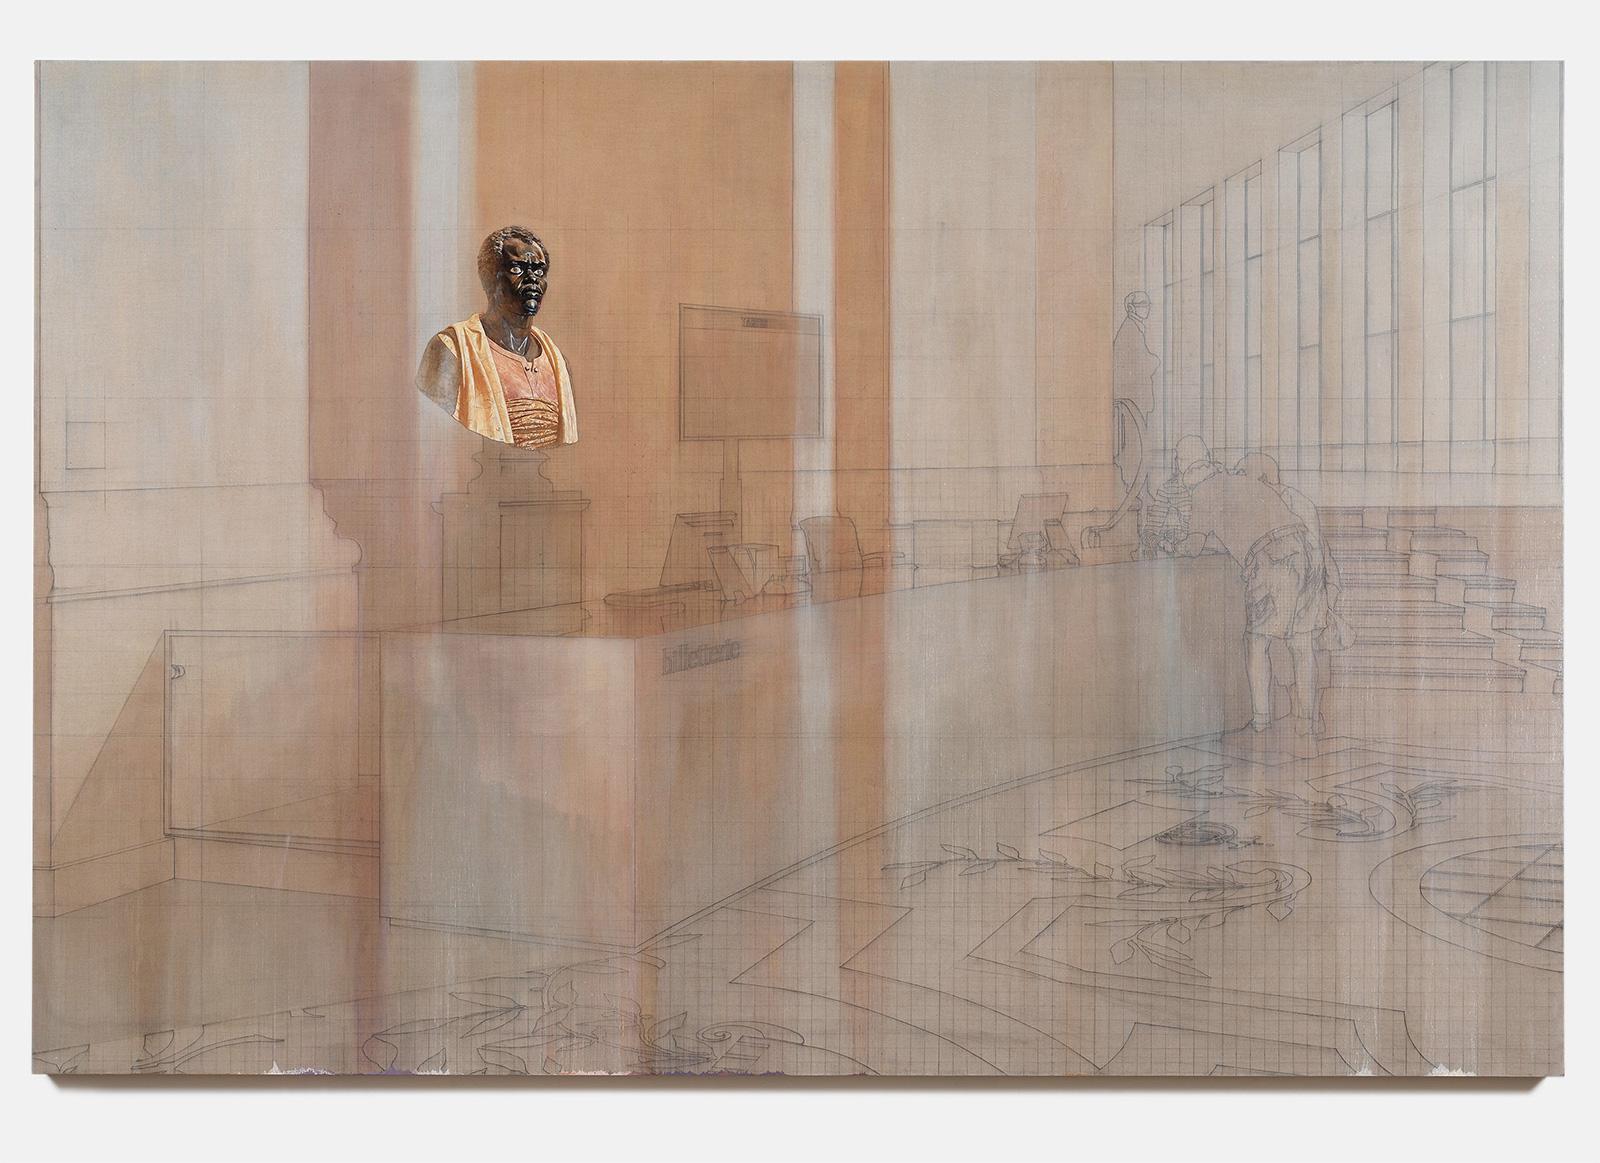 Esteban Jefferson, Billetterie, 2021. Courtesy of the artist and Tanya Leighton Gallery